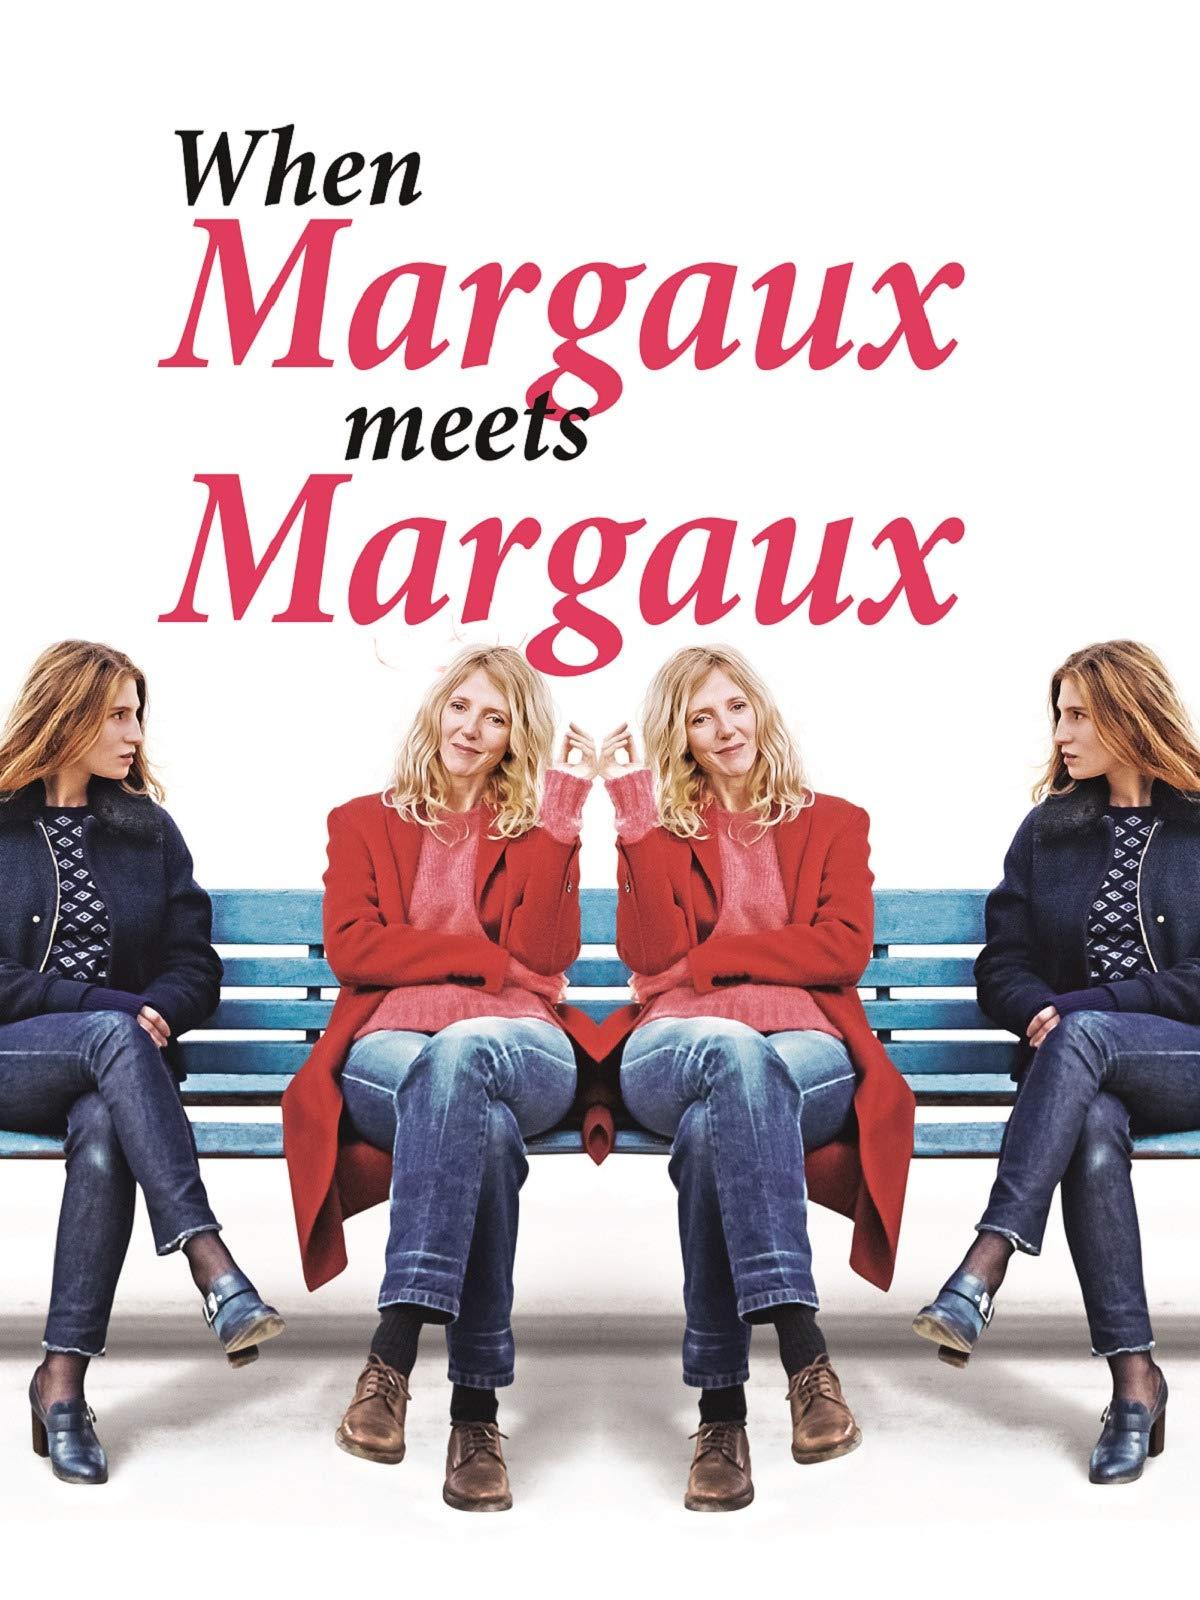 When Margaux meets Margaux